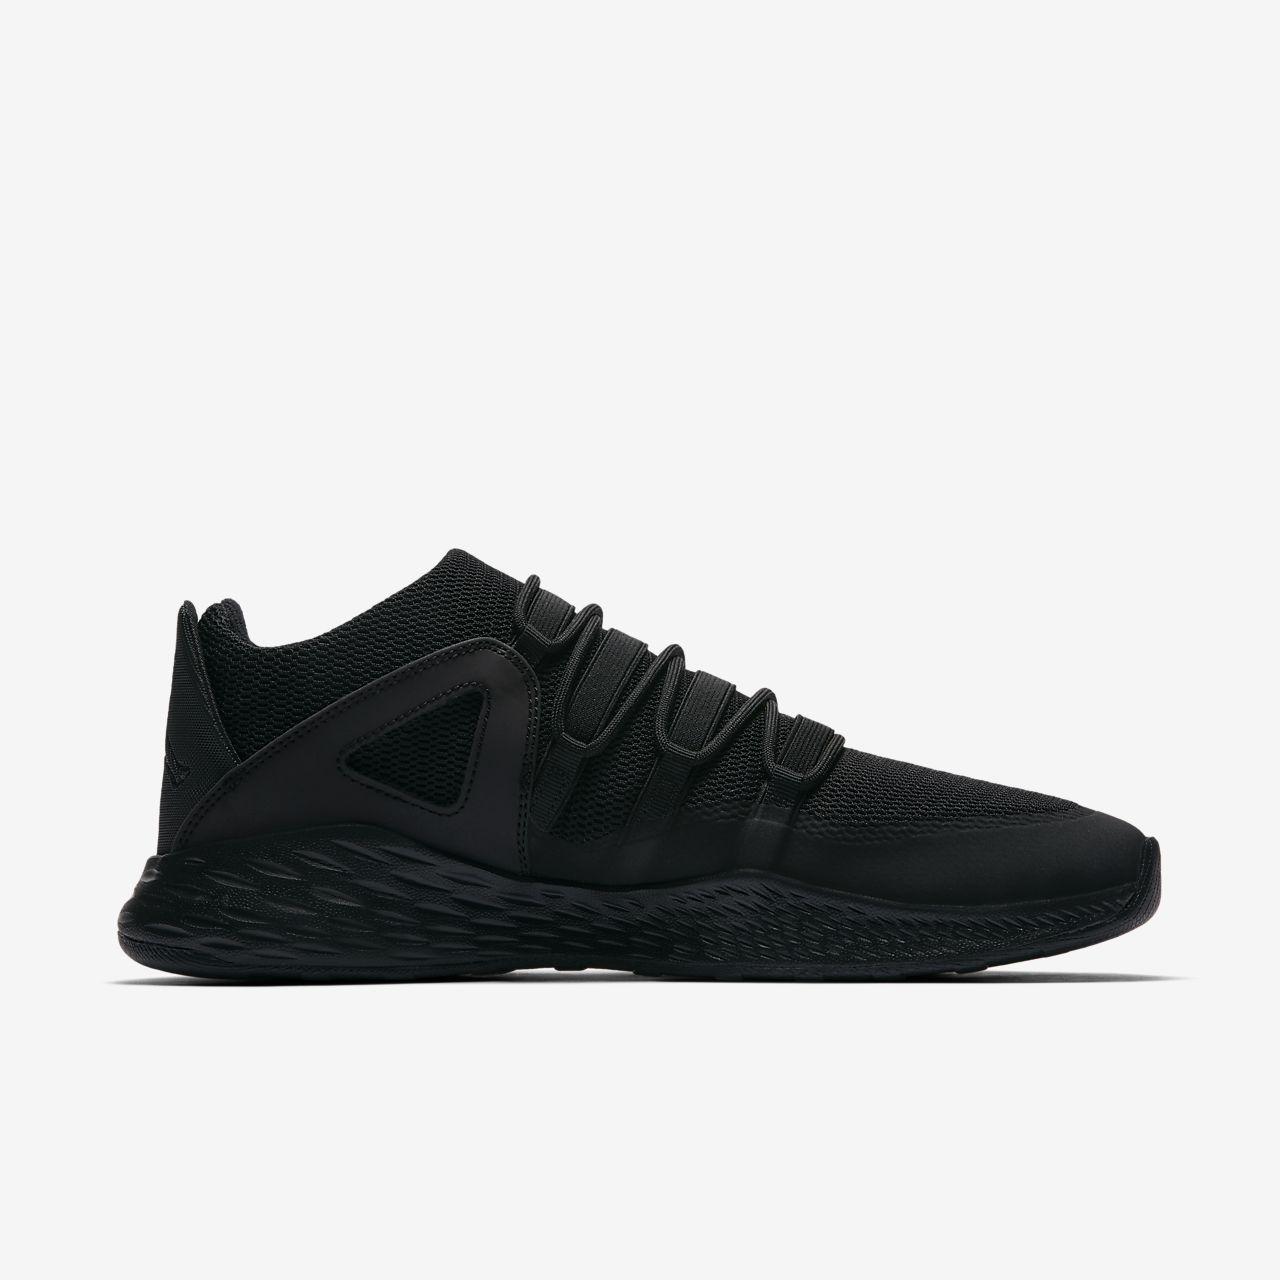 Chaussures Nike Formula 23 3z1sck2Q0